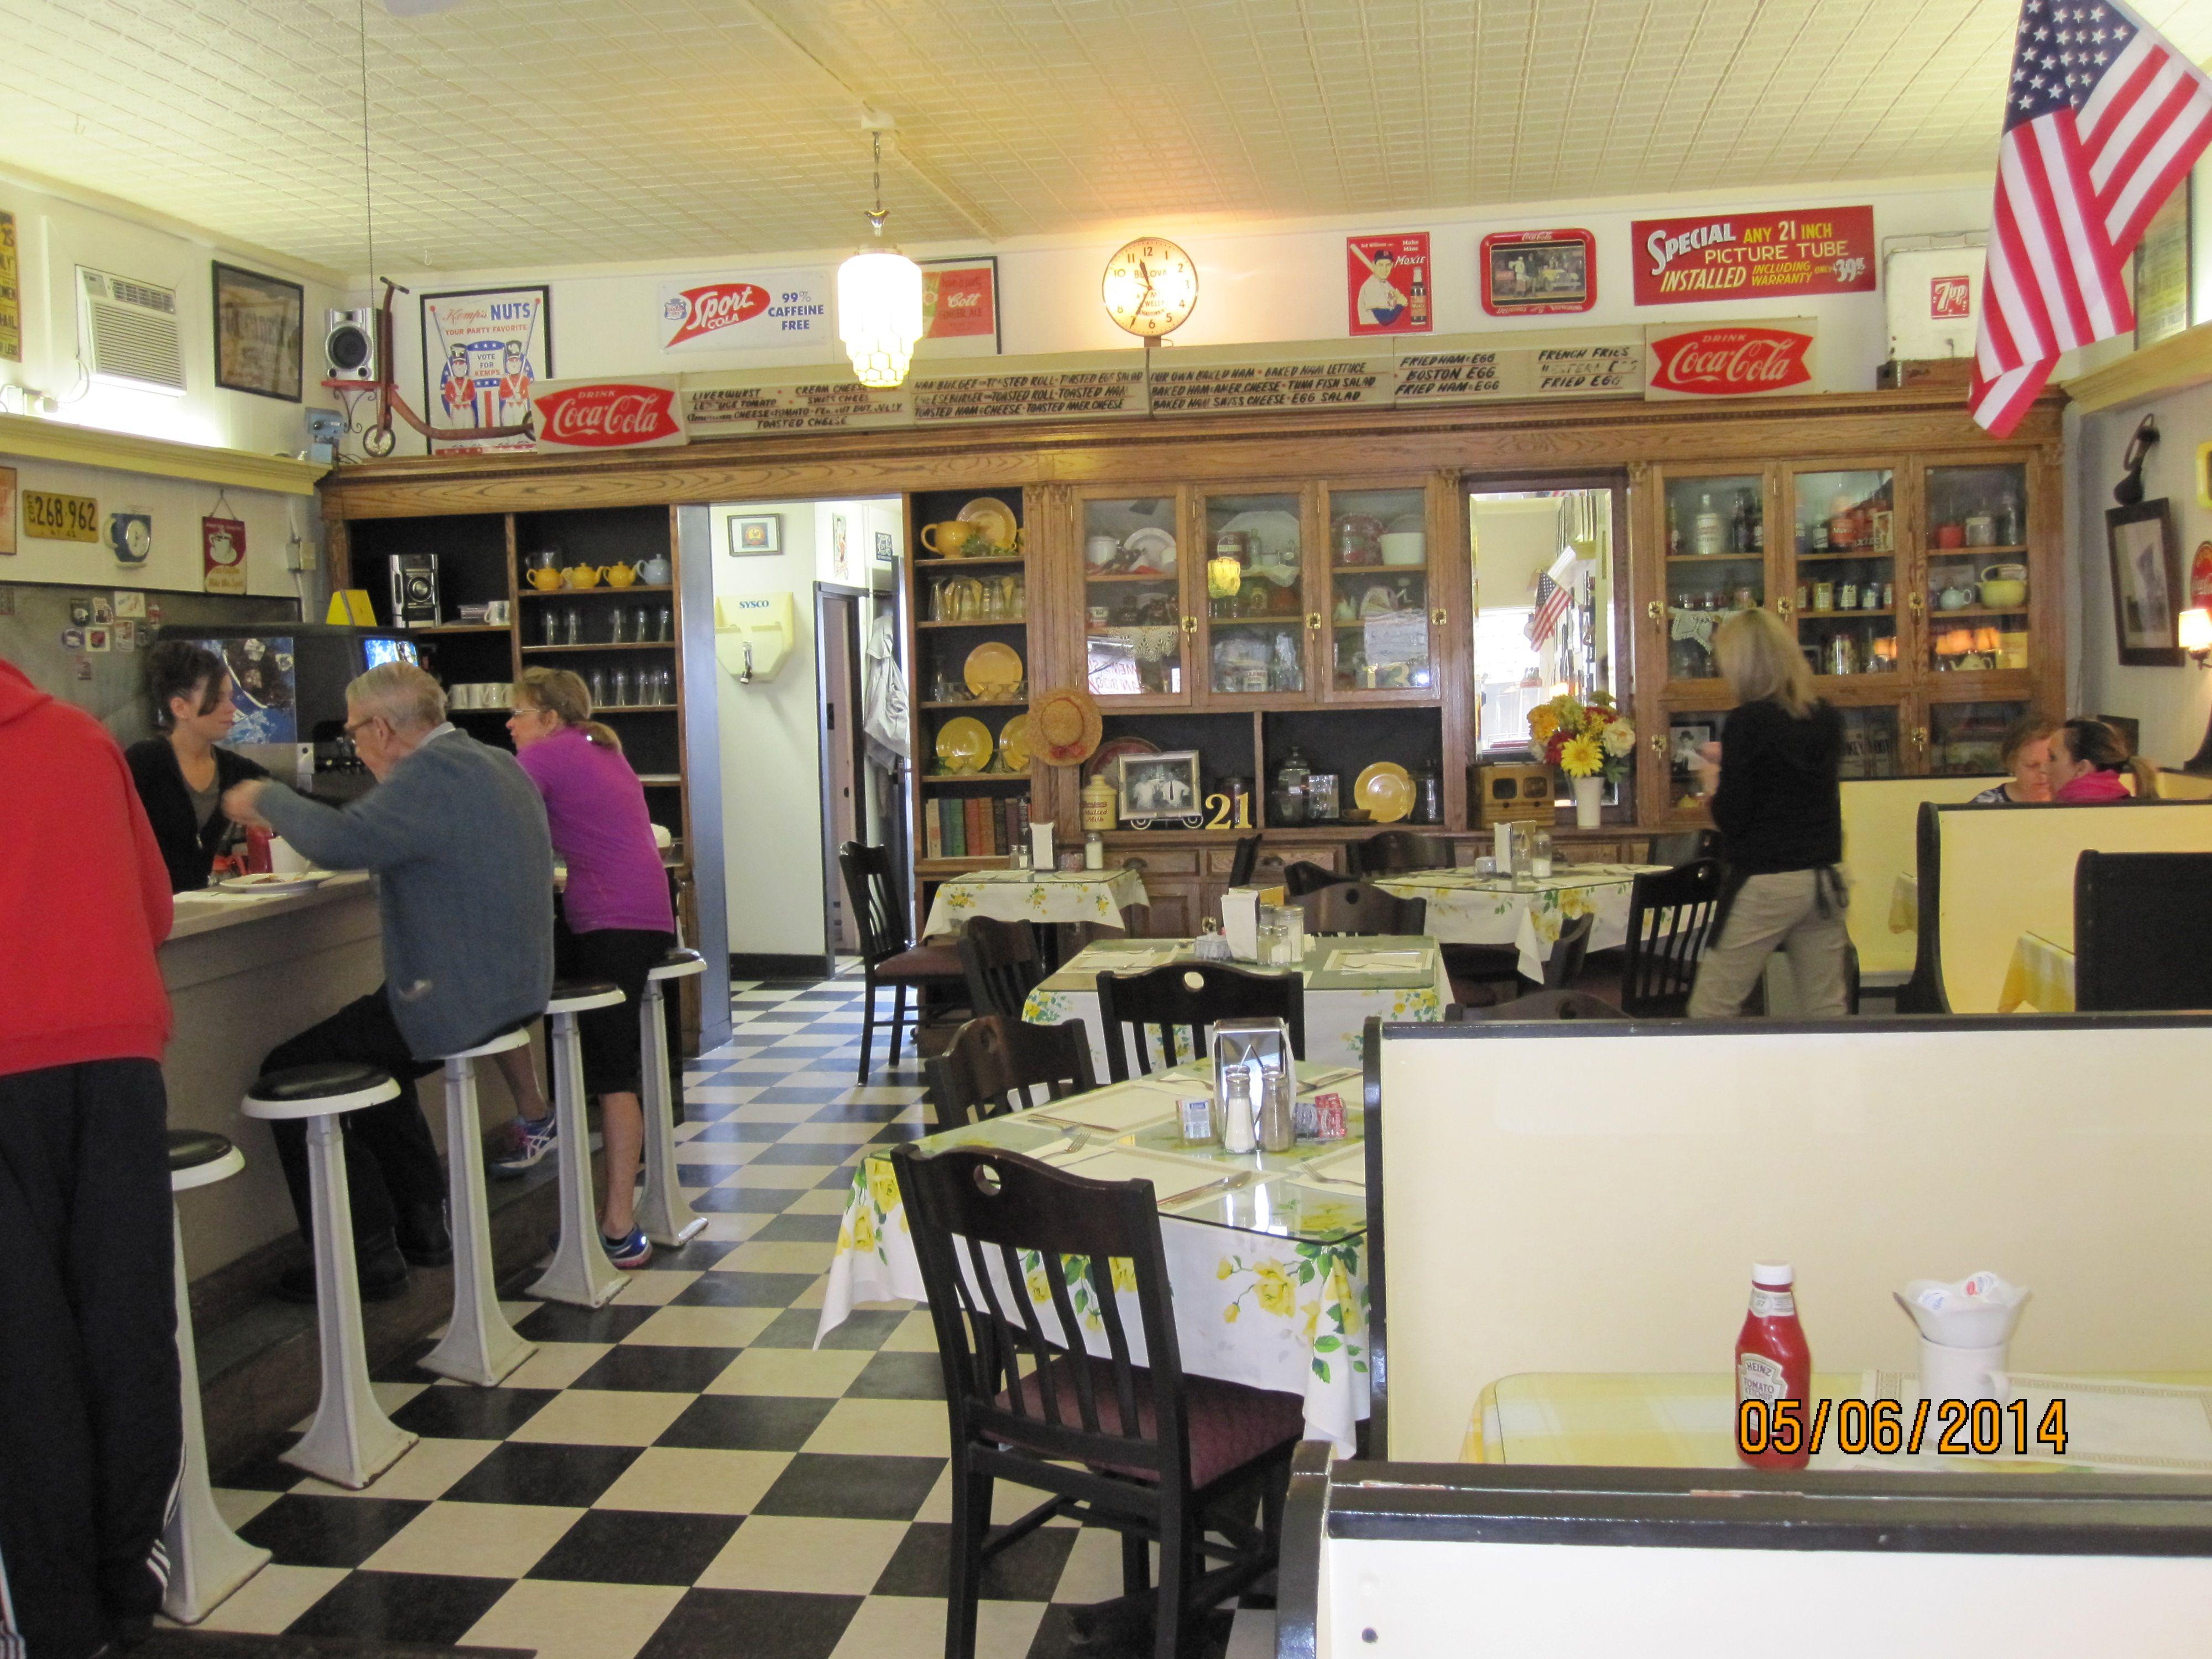 Johnstown Ny New York Johnstown Retro Cafe Vintage Cafe